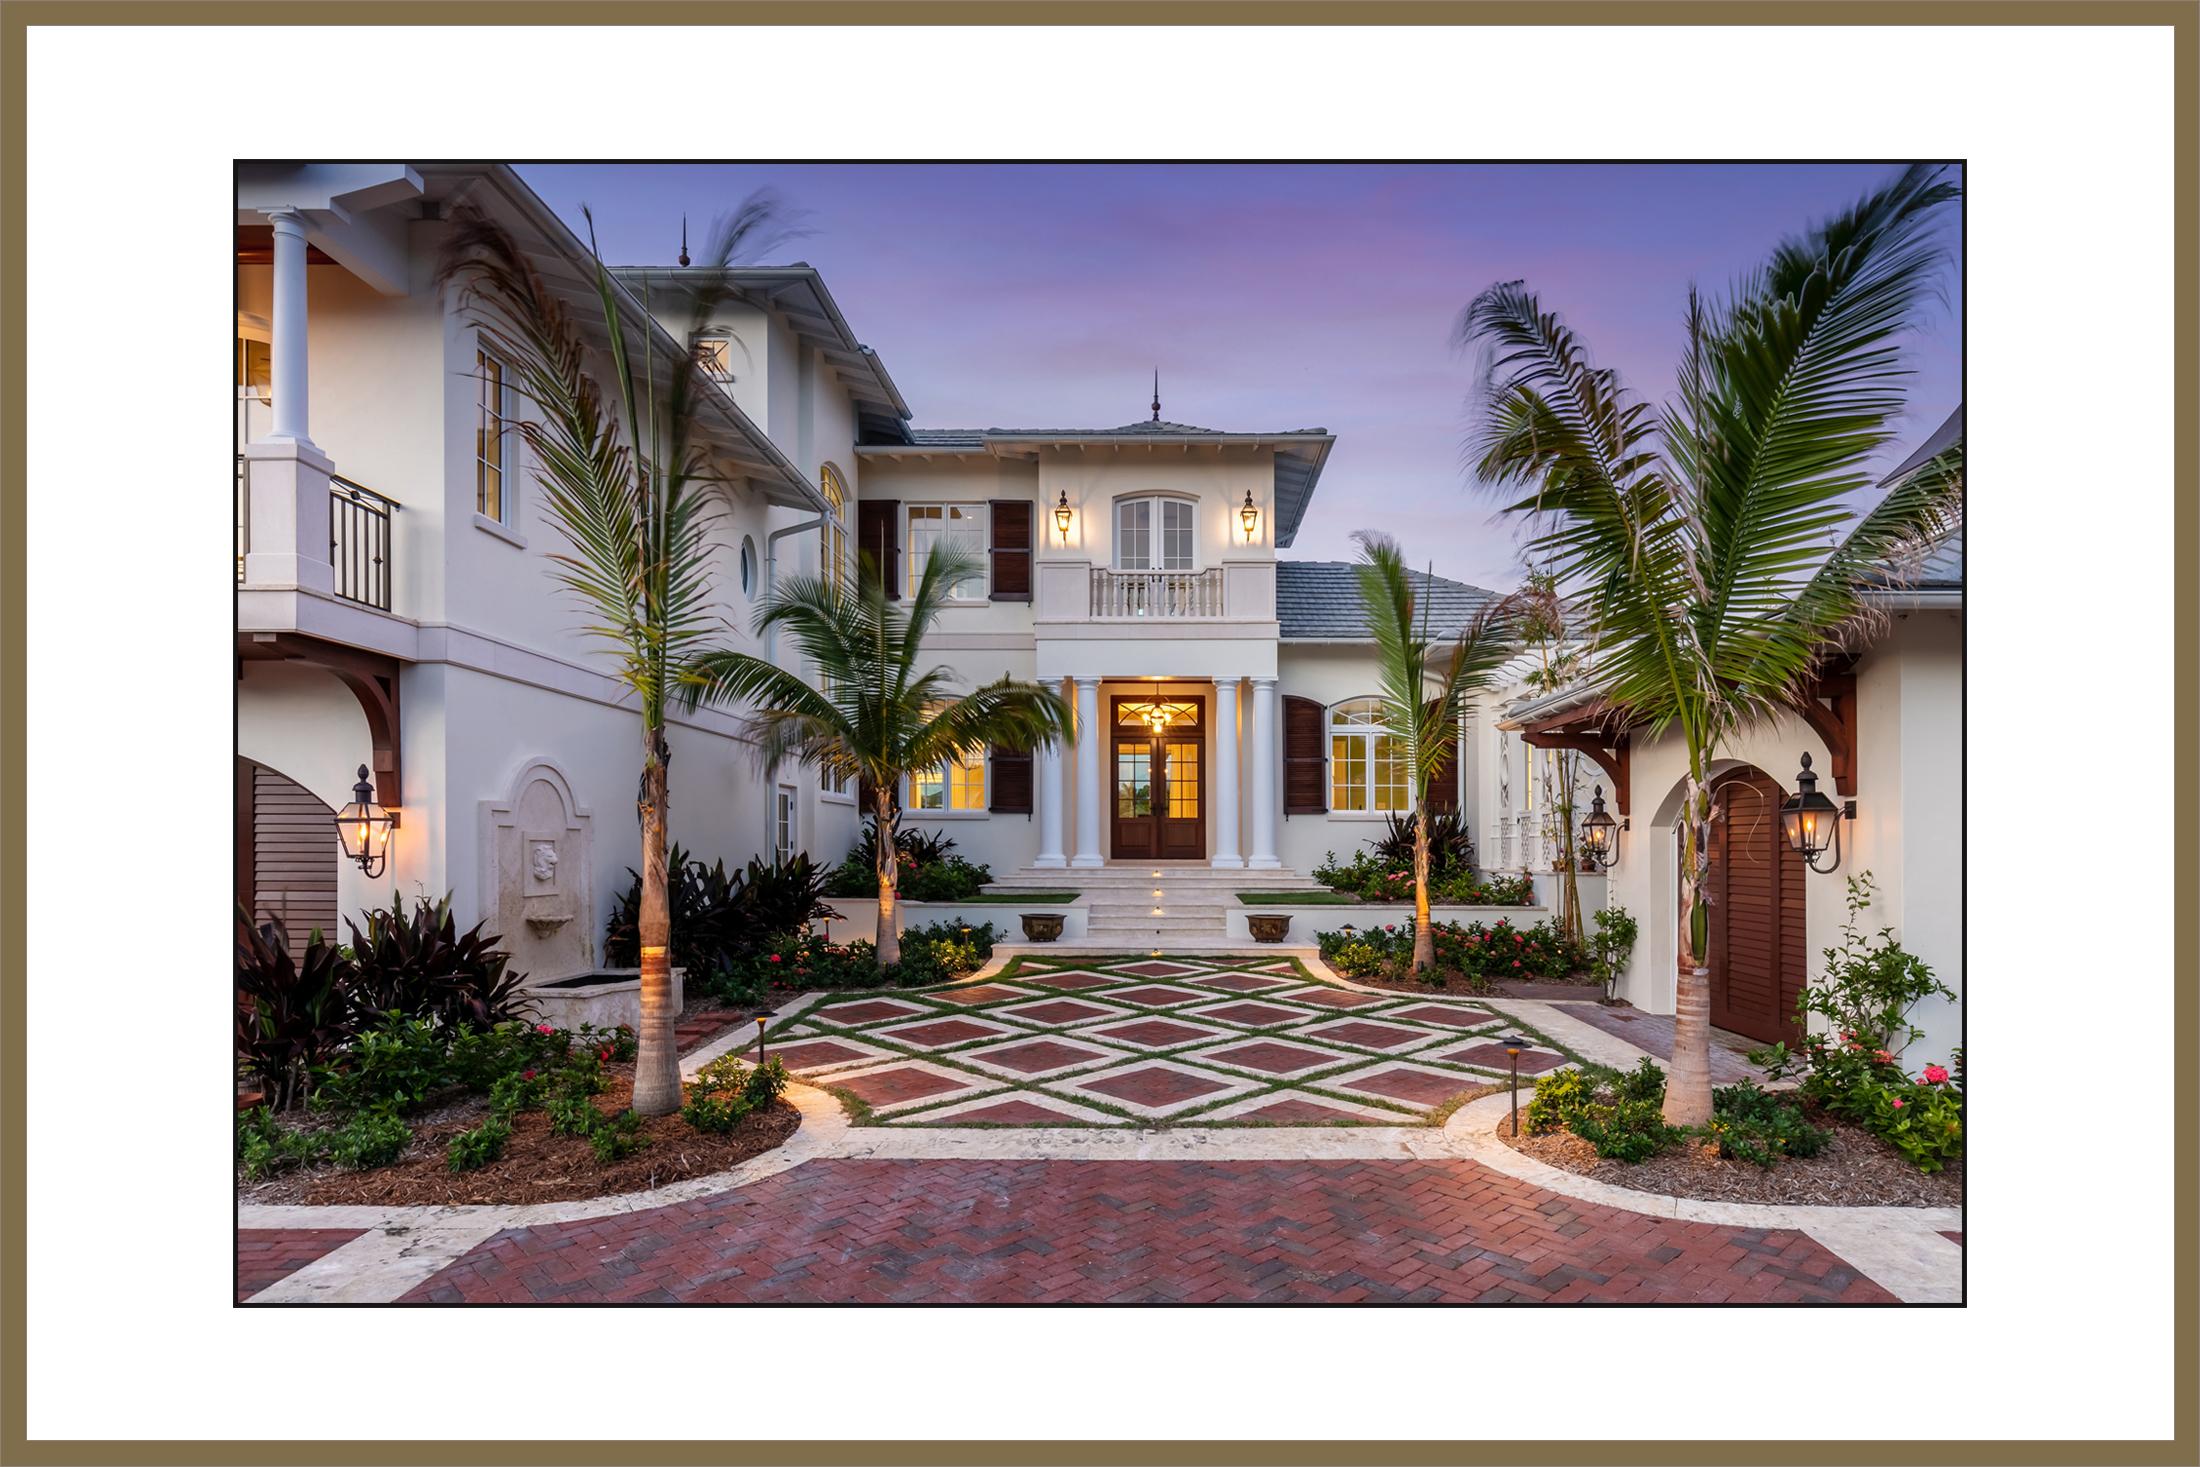 Interior Design for British West Indies Style Homes